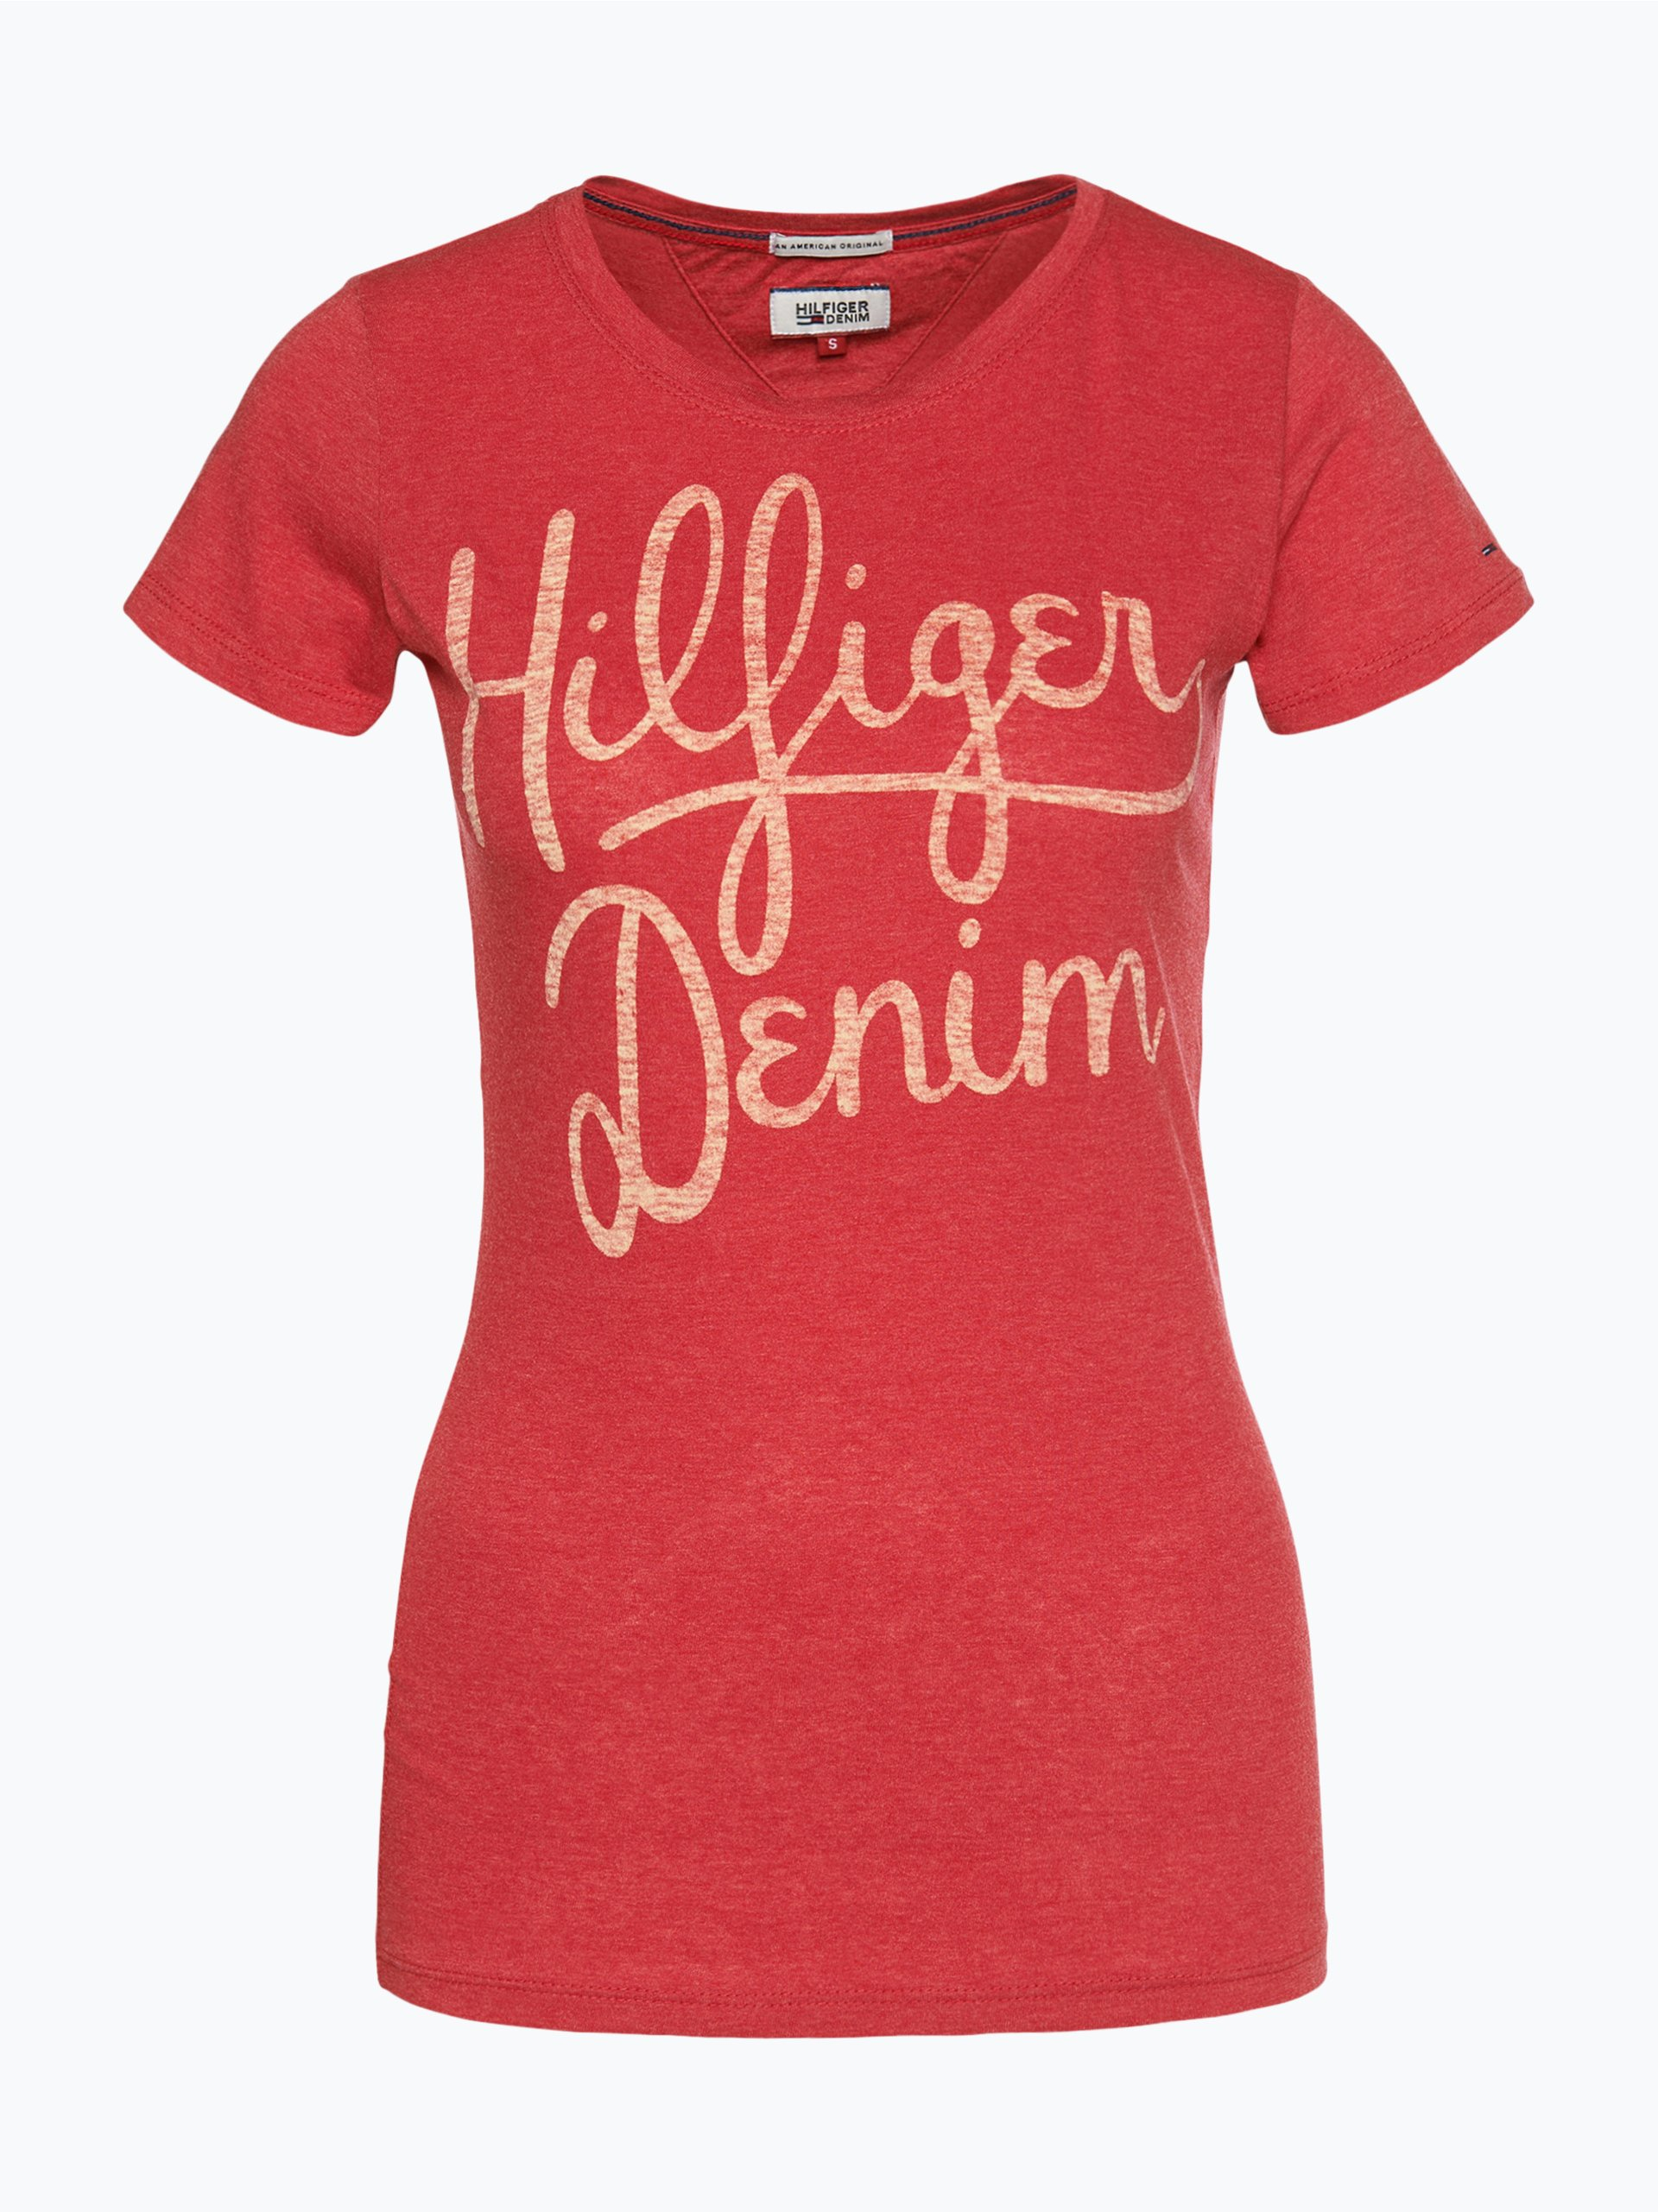 tommy jeans damen t shirt rot uni online kaufen peek und. Black Bedroom Furniture Sets. Home Design Ideas